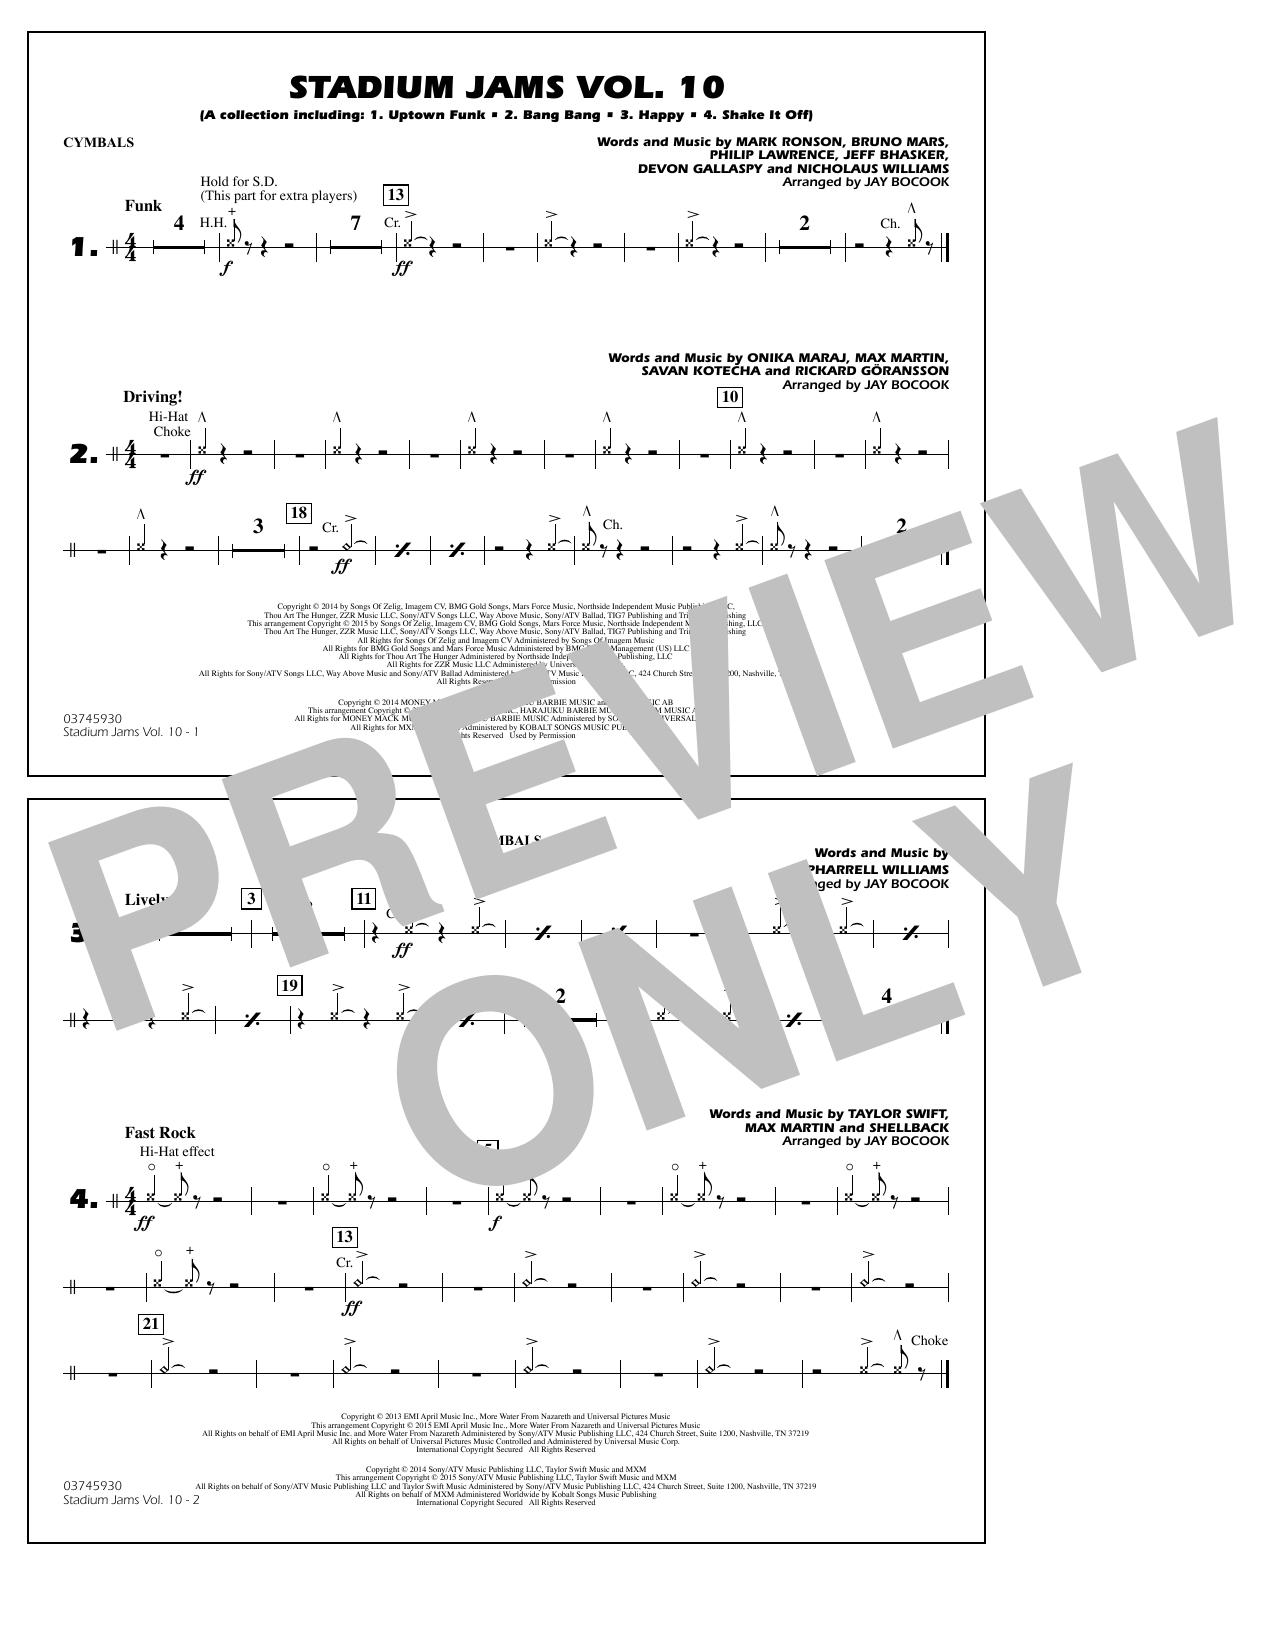 Stadium Jams Vol. 10 - Cymbals (Marching Band)